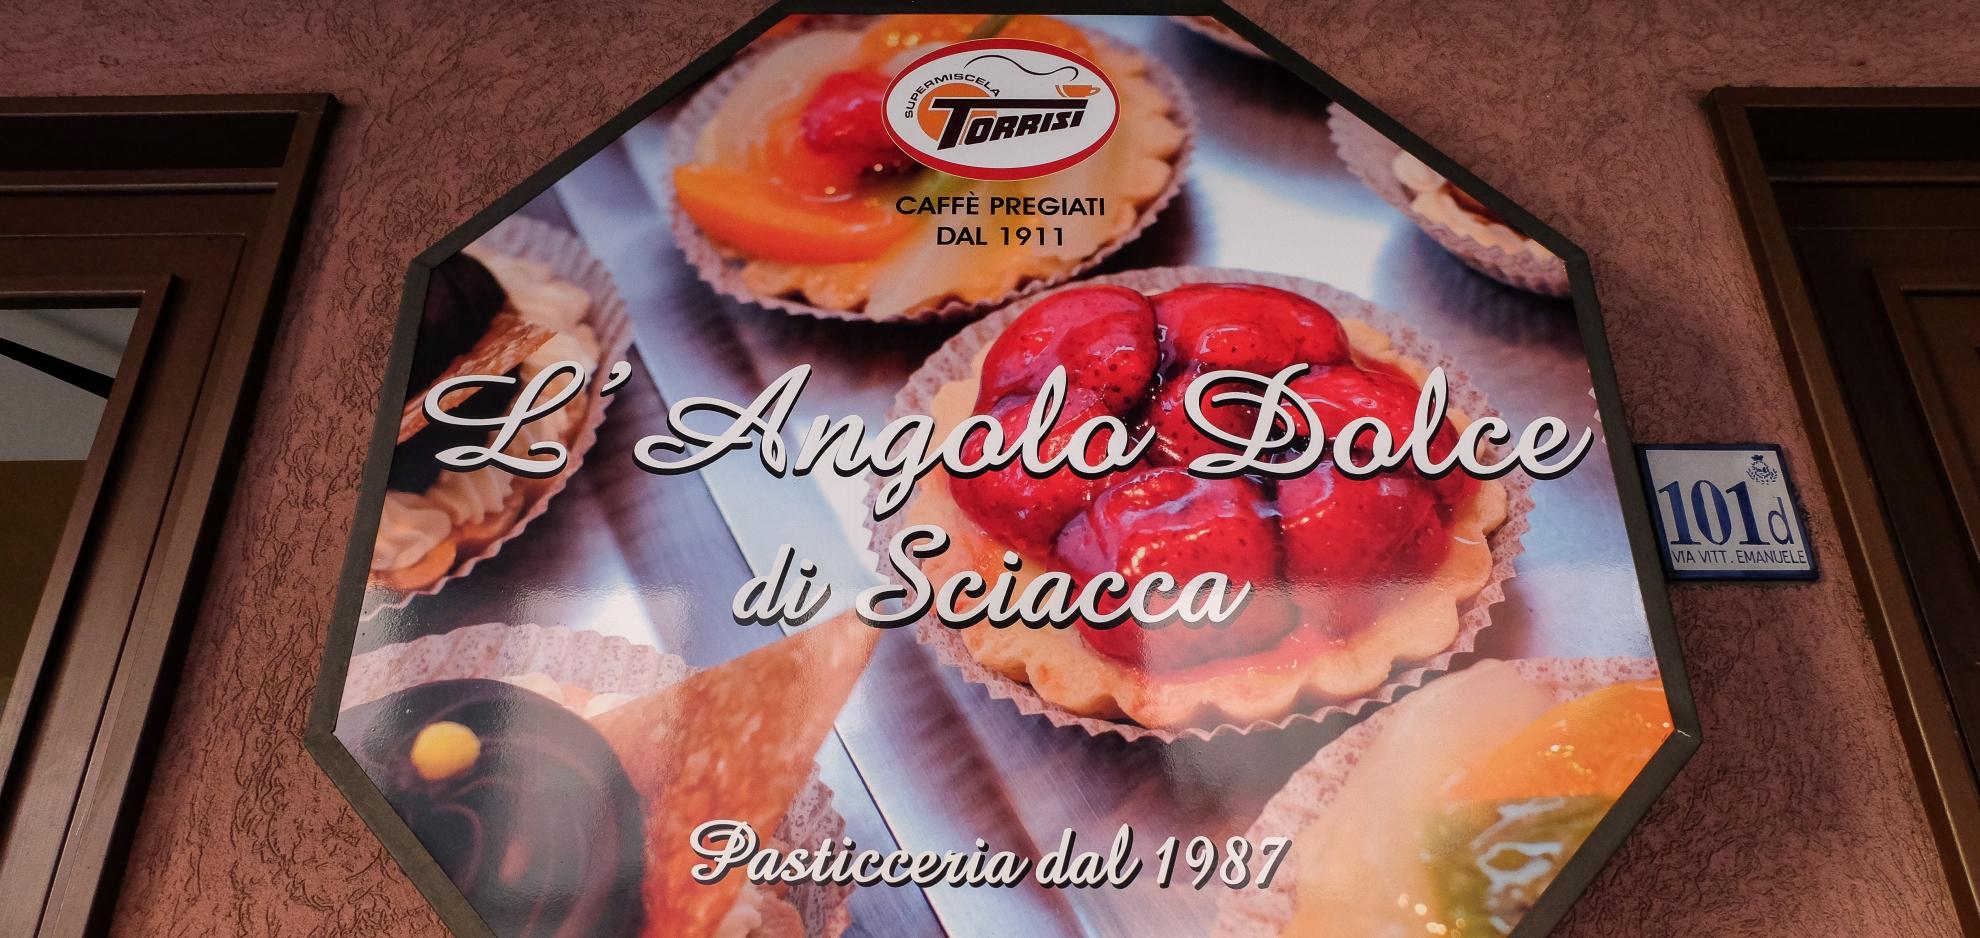 L'angolo dolce di Sciacca - Bar Gelateria, Aci Catena